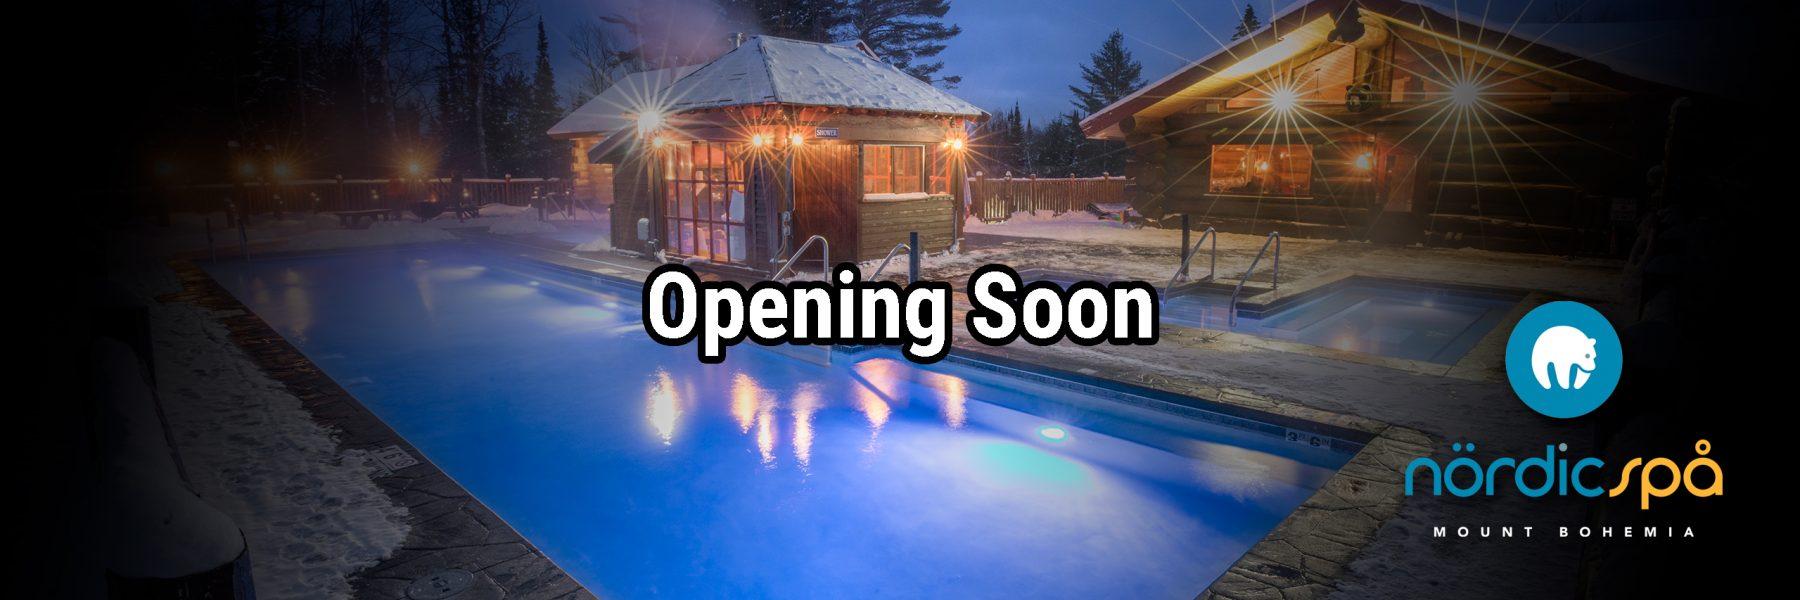 nordic spa opening soon